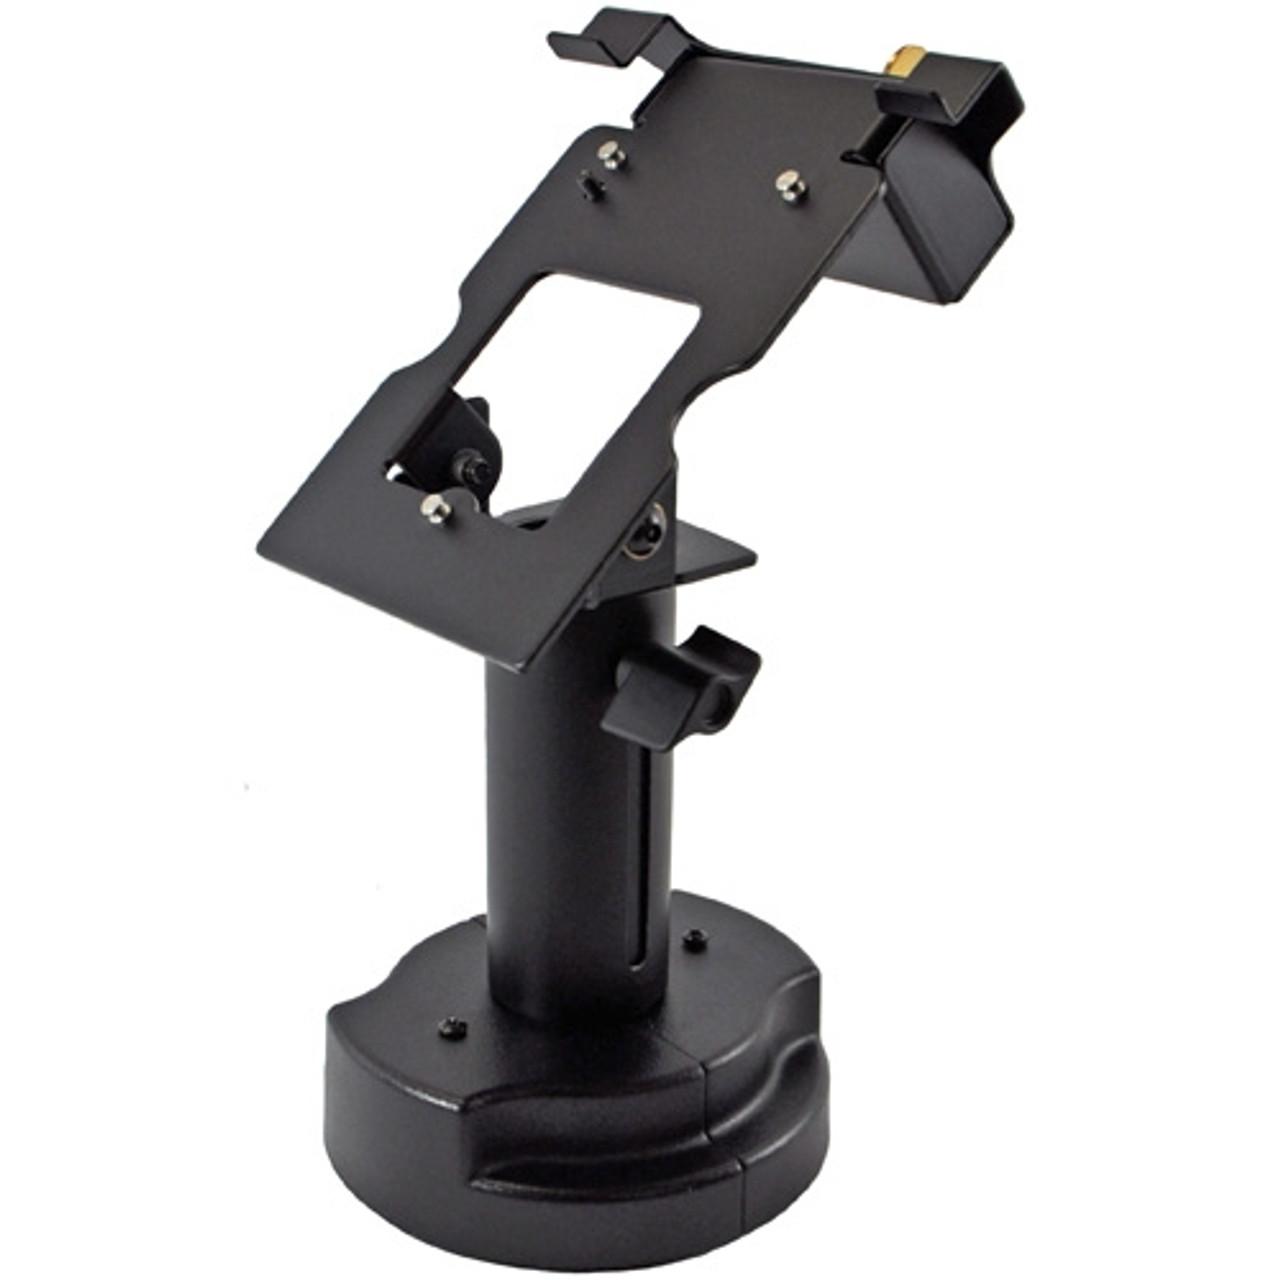 Swivel Stands Credit Card Stand Locking Telescoping Pedestal VeriFone MX925